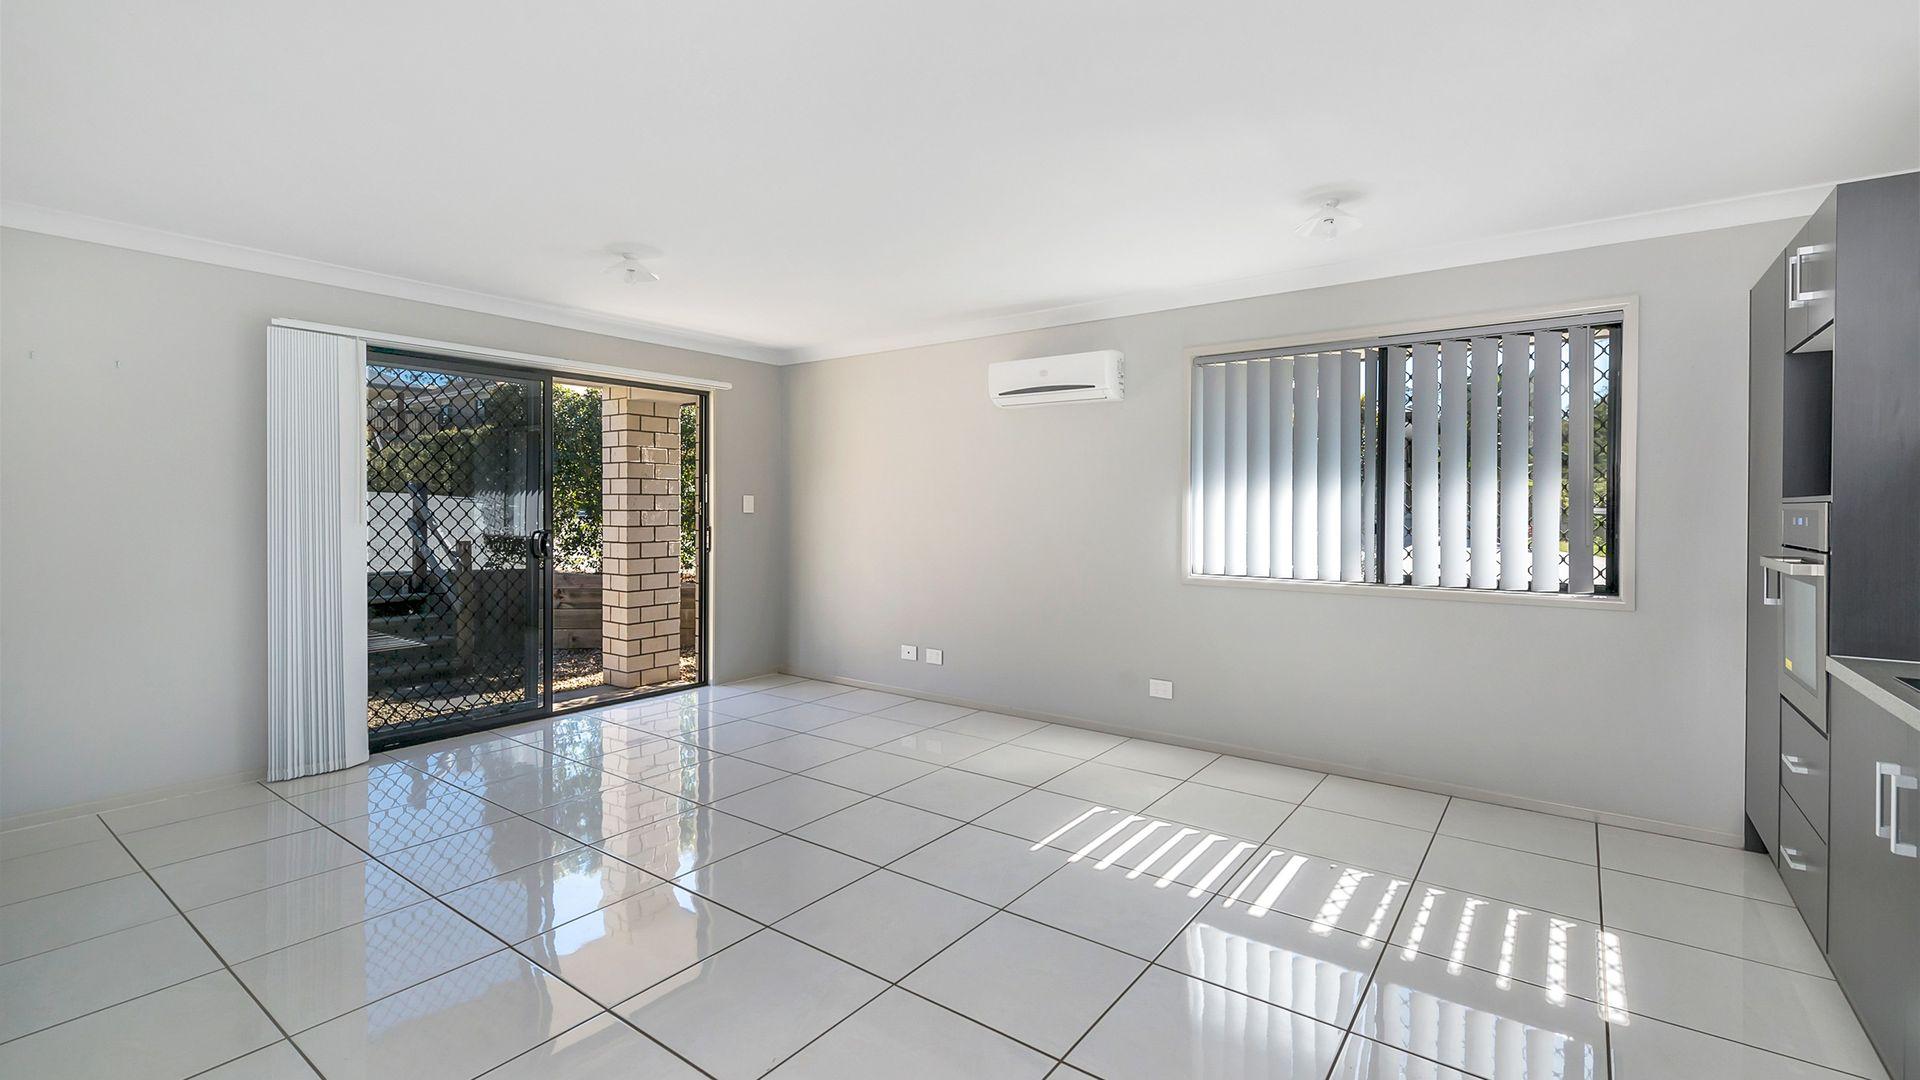 8A Knightsbridge St, Oxley QLD 4075, Image 2